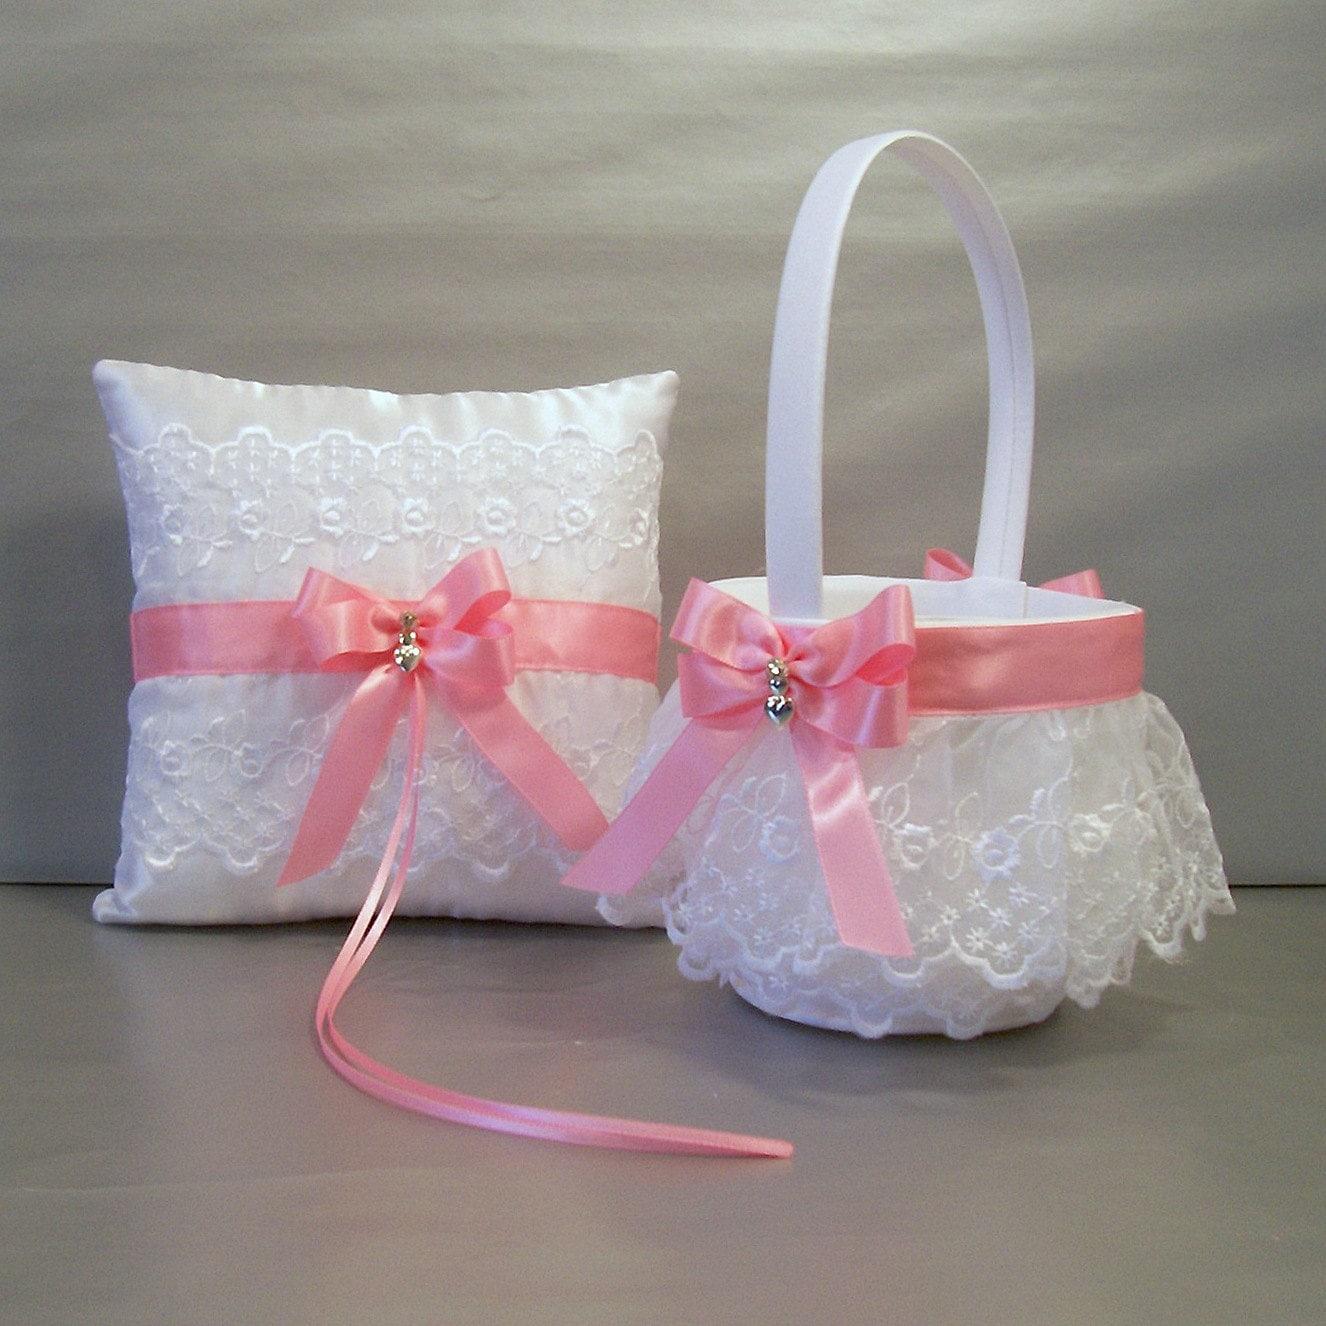 Remarkable Wedding Flower Basket and Ring Pillow Set Photos Design ...